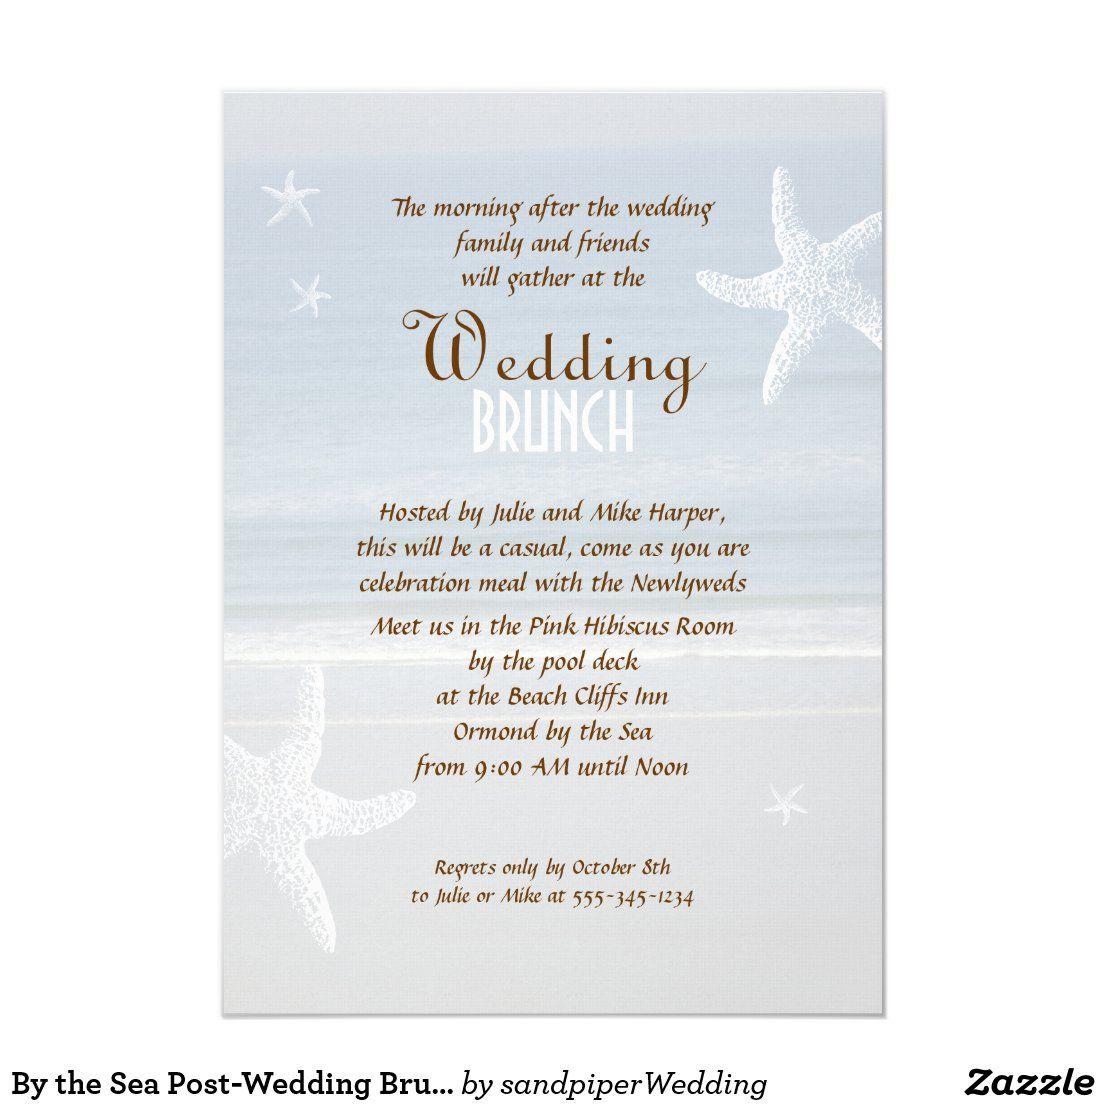 By The Sea Post Wedding Brunch Invitation Zazzle Com In 2020 Post Wedding Brunch Invitations Brunch Invitations Brunch Wedding